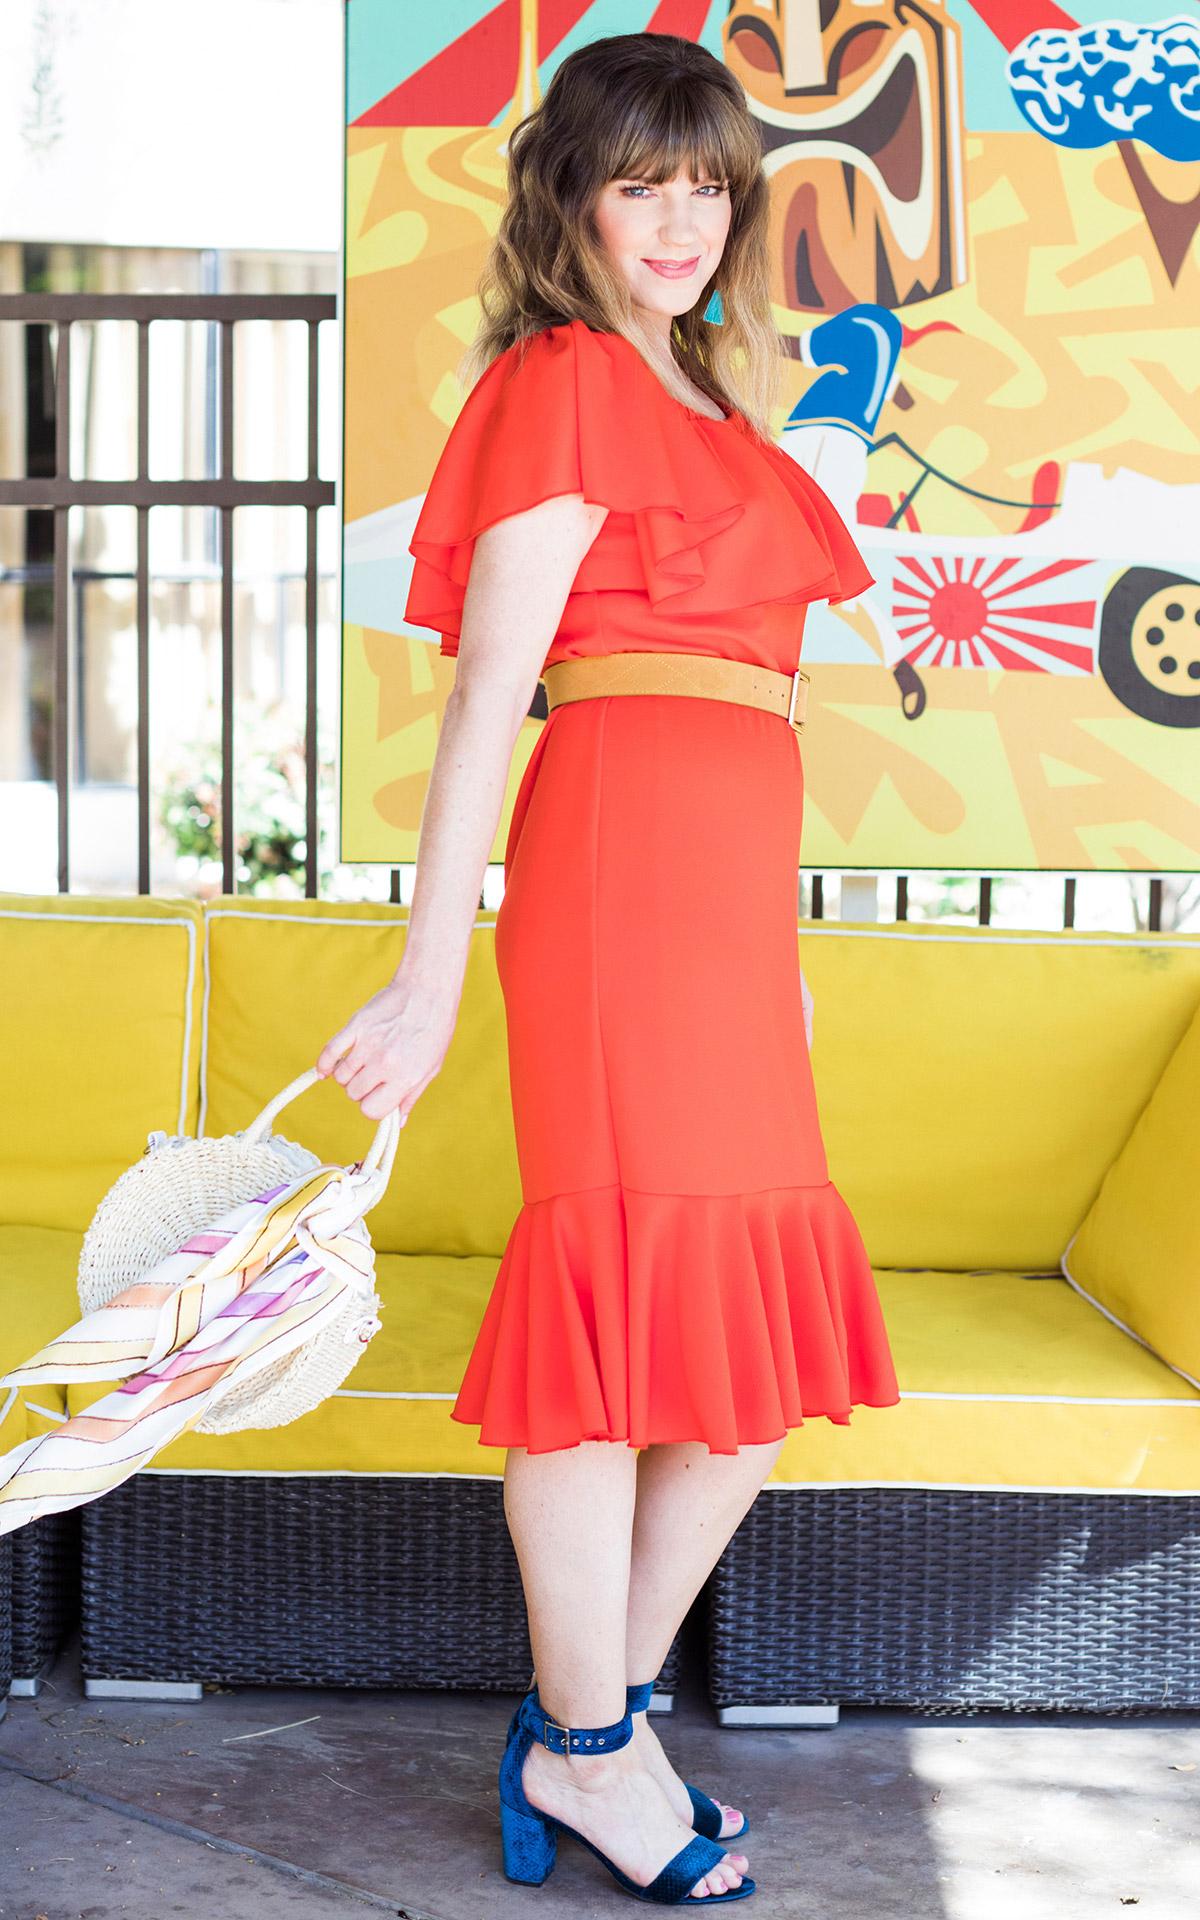 LuLaRoe-Cici-Flounce-tropical-dress-bright-orange.jpg